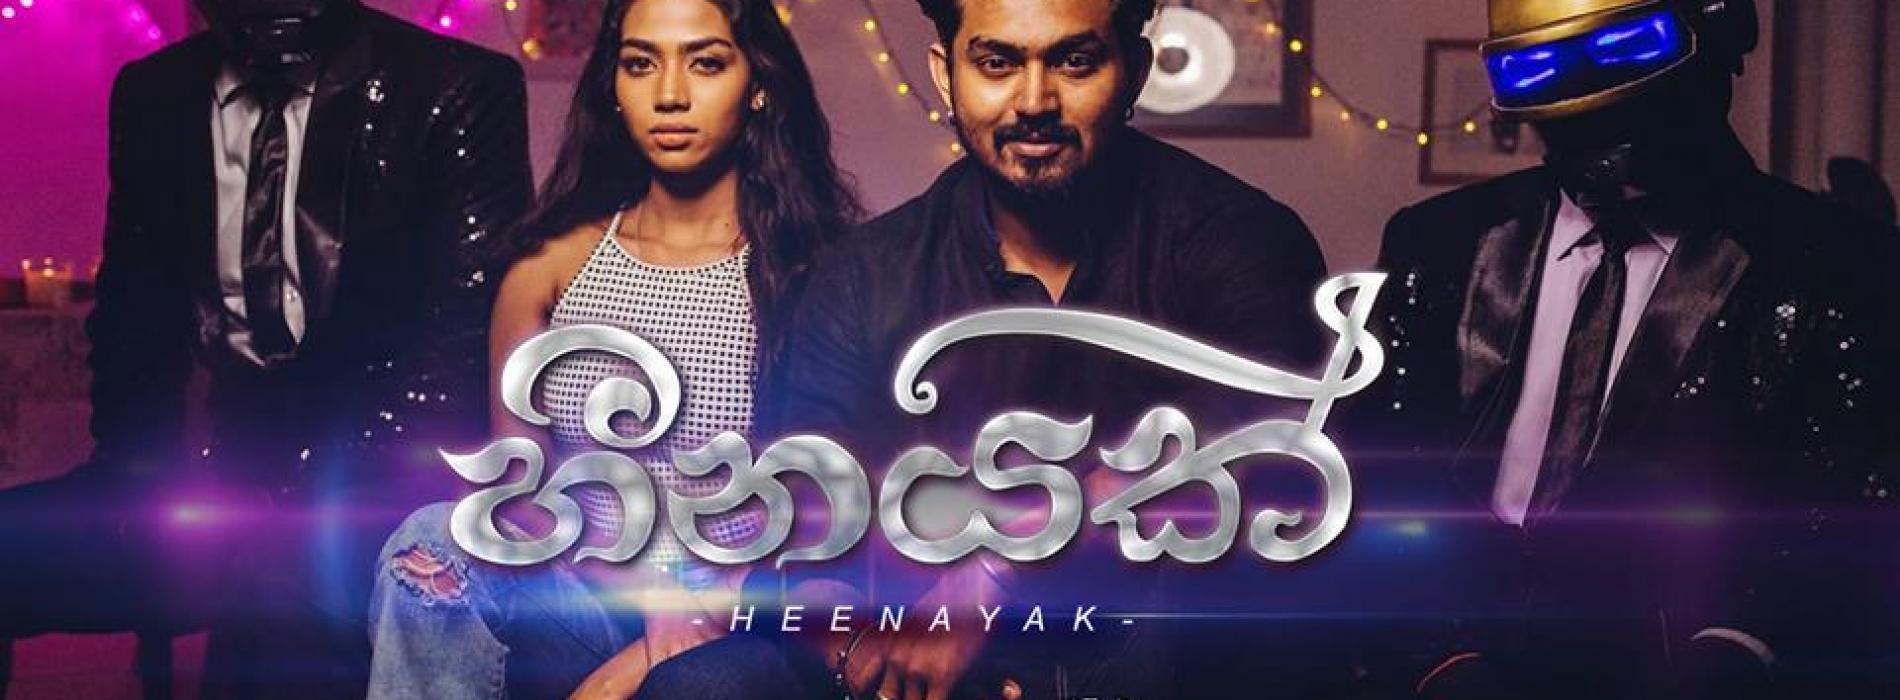 Heenayak (හීනයක්) by FamousC | Charith Jayaneththi